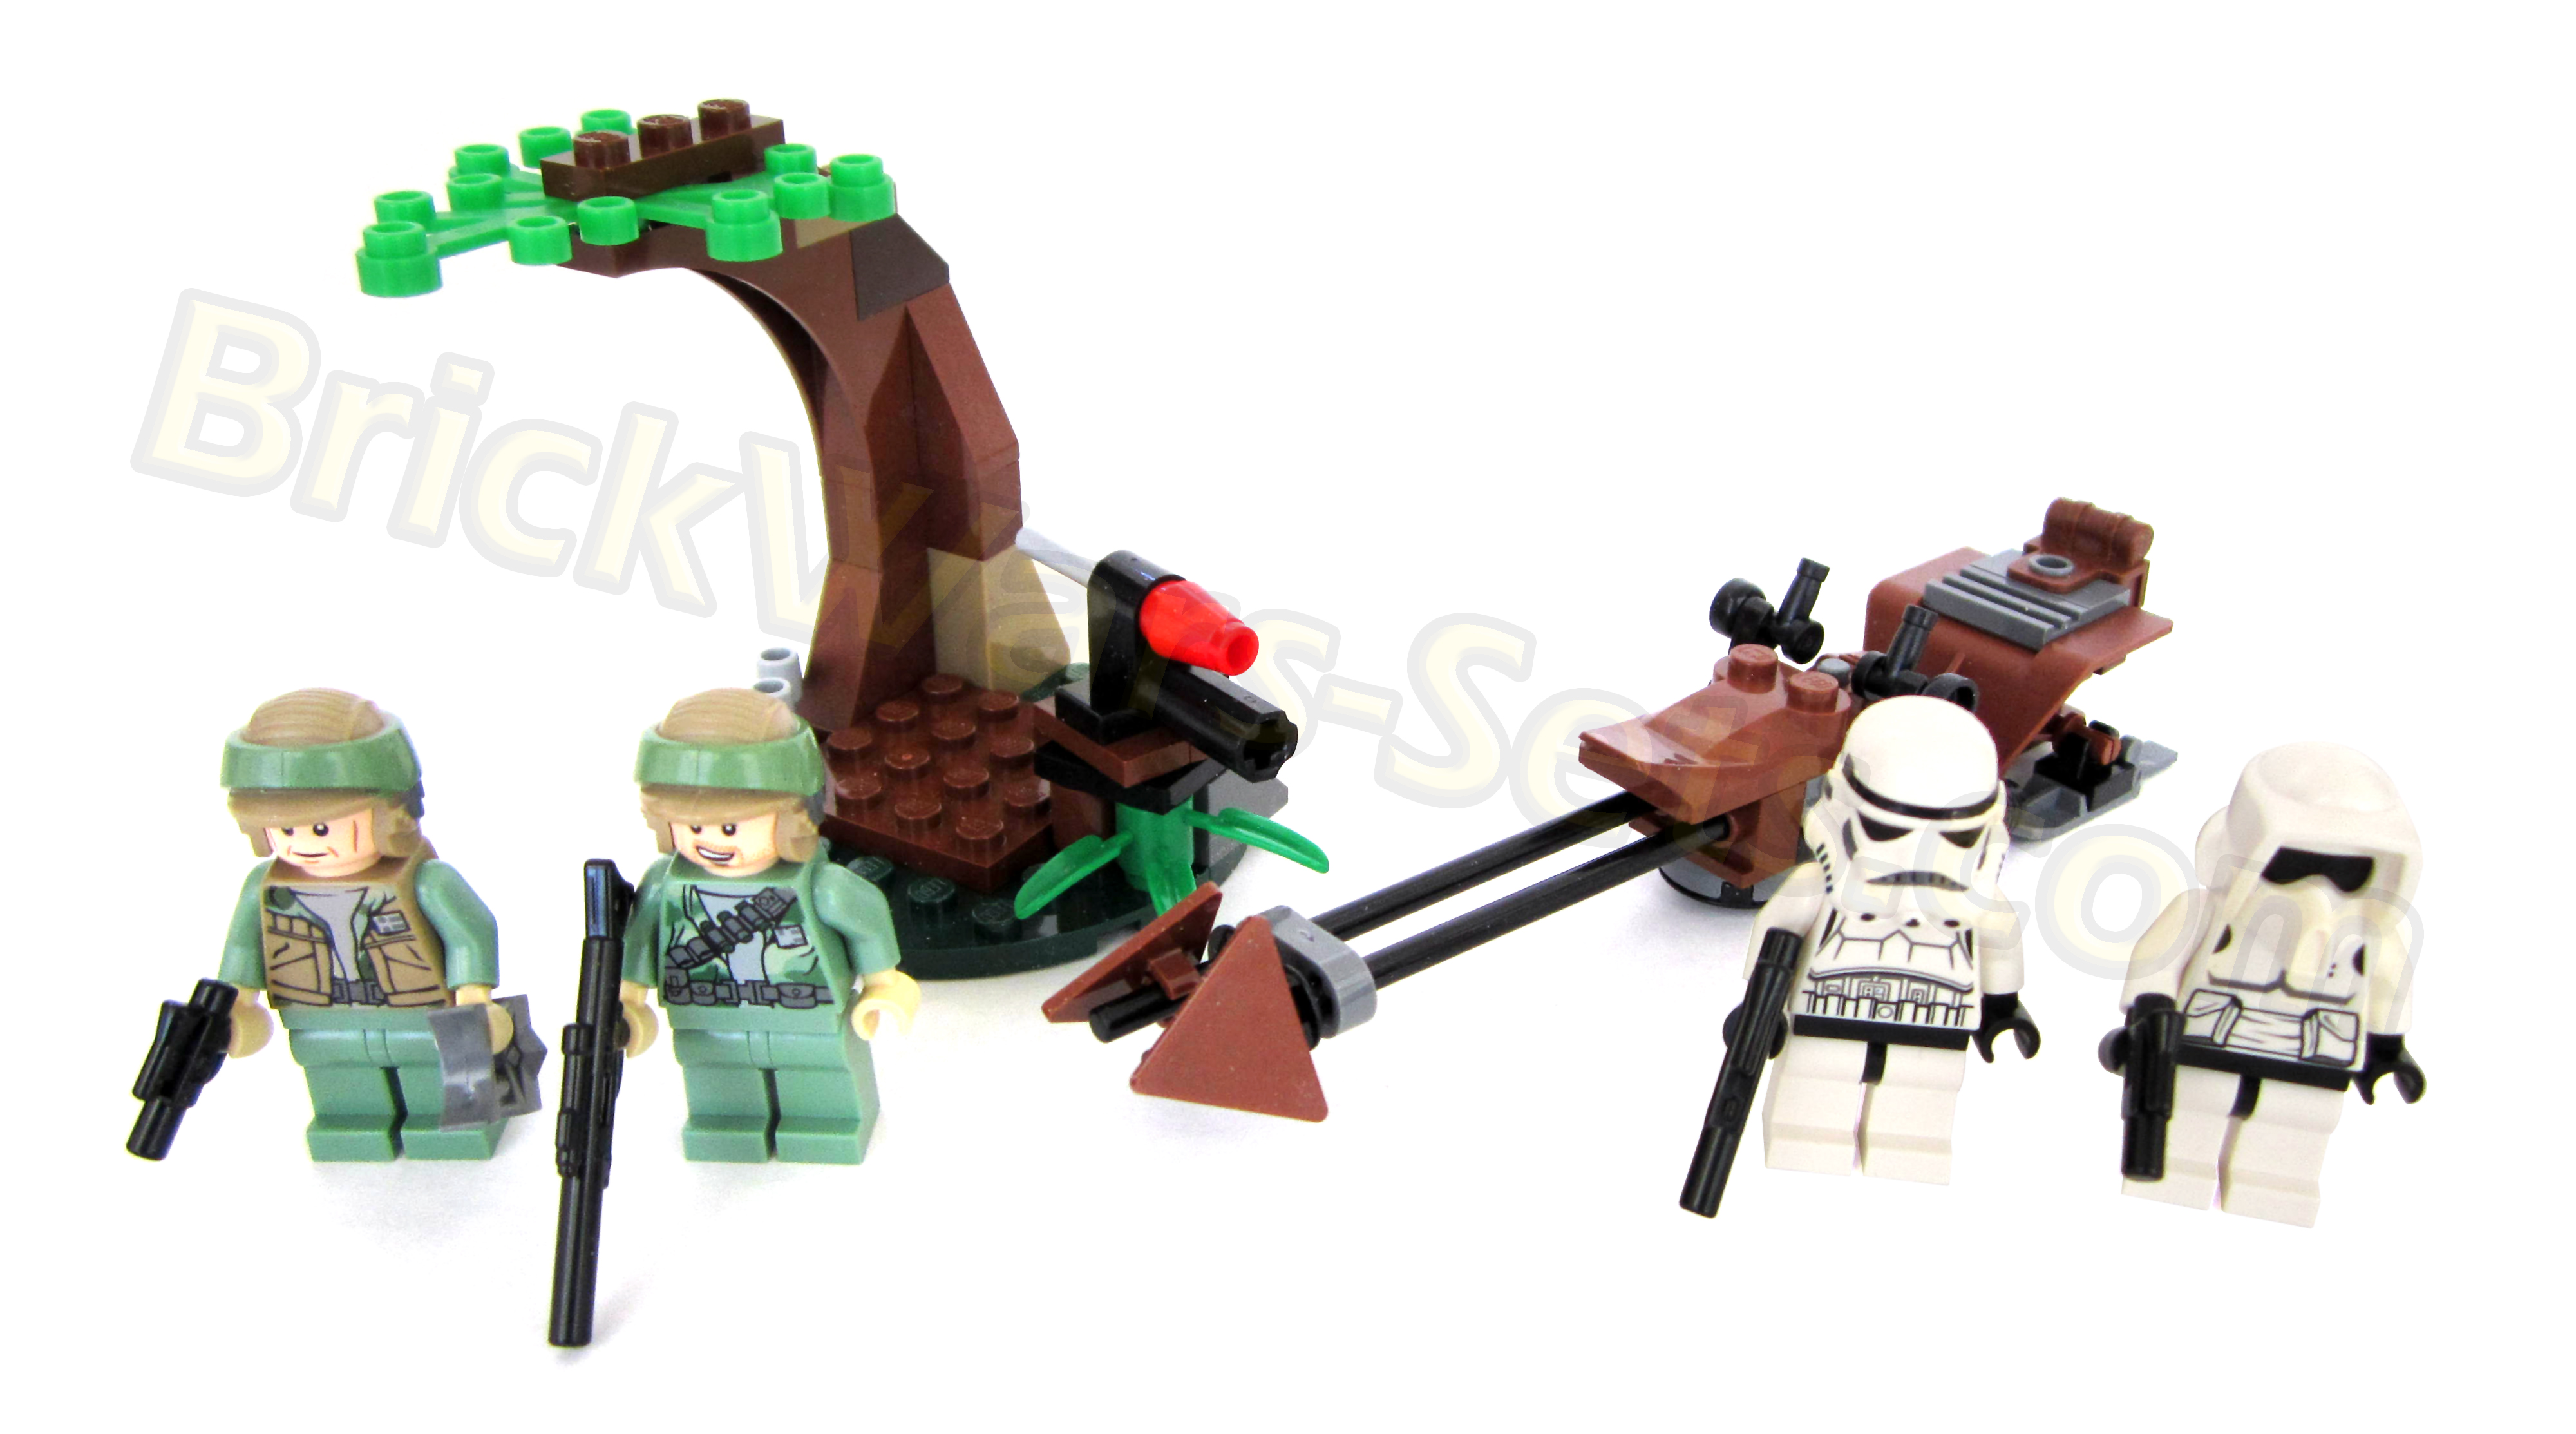 LEGO STAR WARS  9489 Endor Rebel Trooper & Imperial Trooper